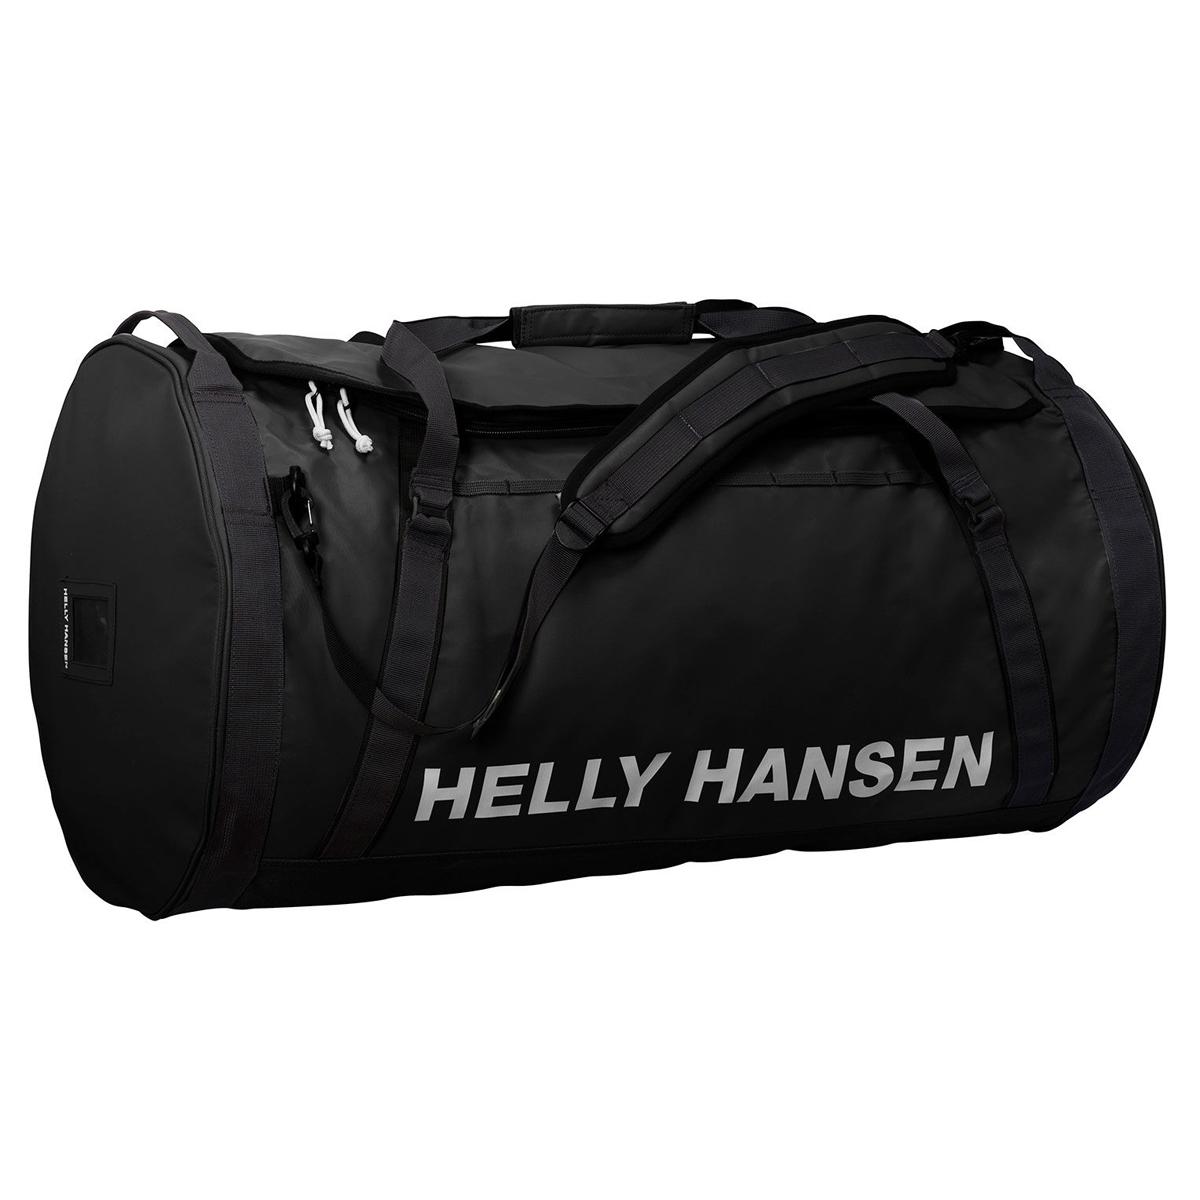 HELLY HANSEN DUFFEL BAG 2 90L (68003)